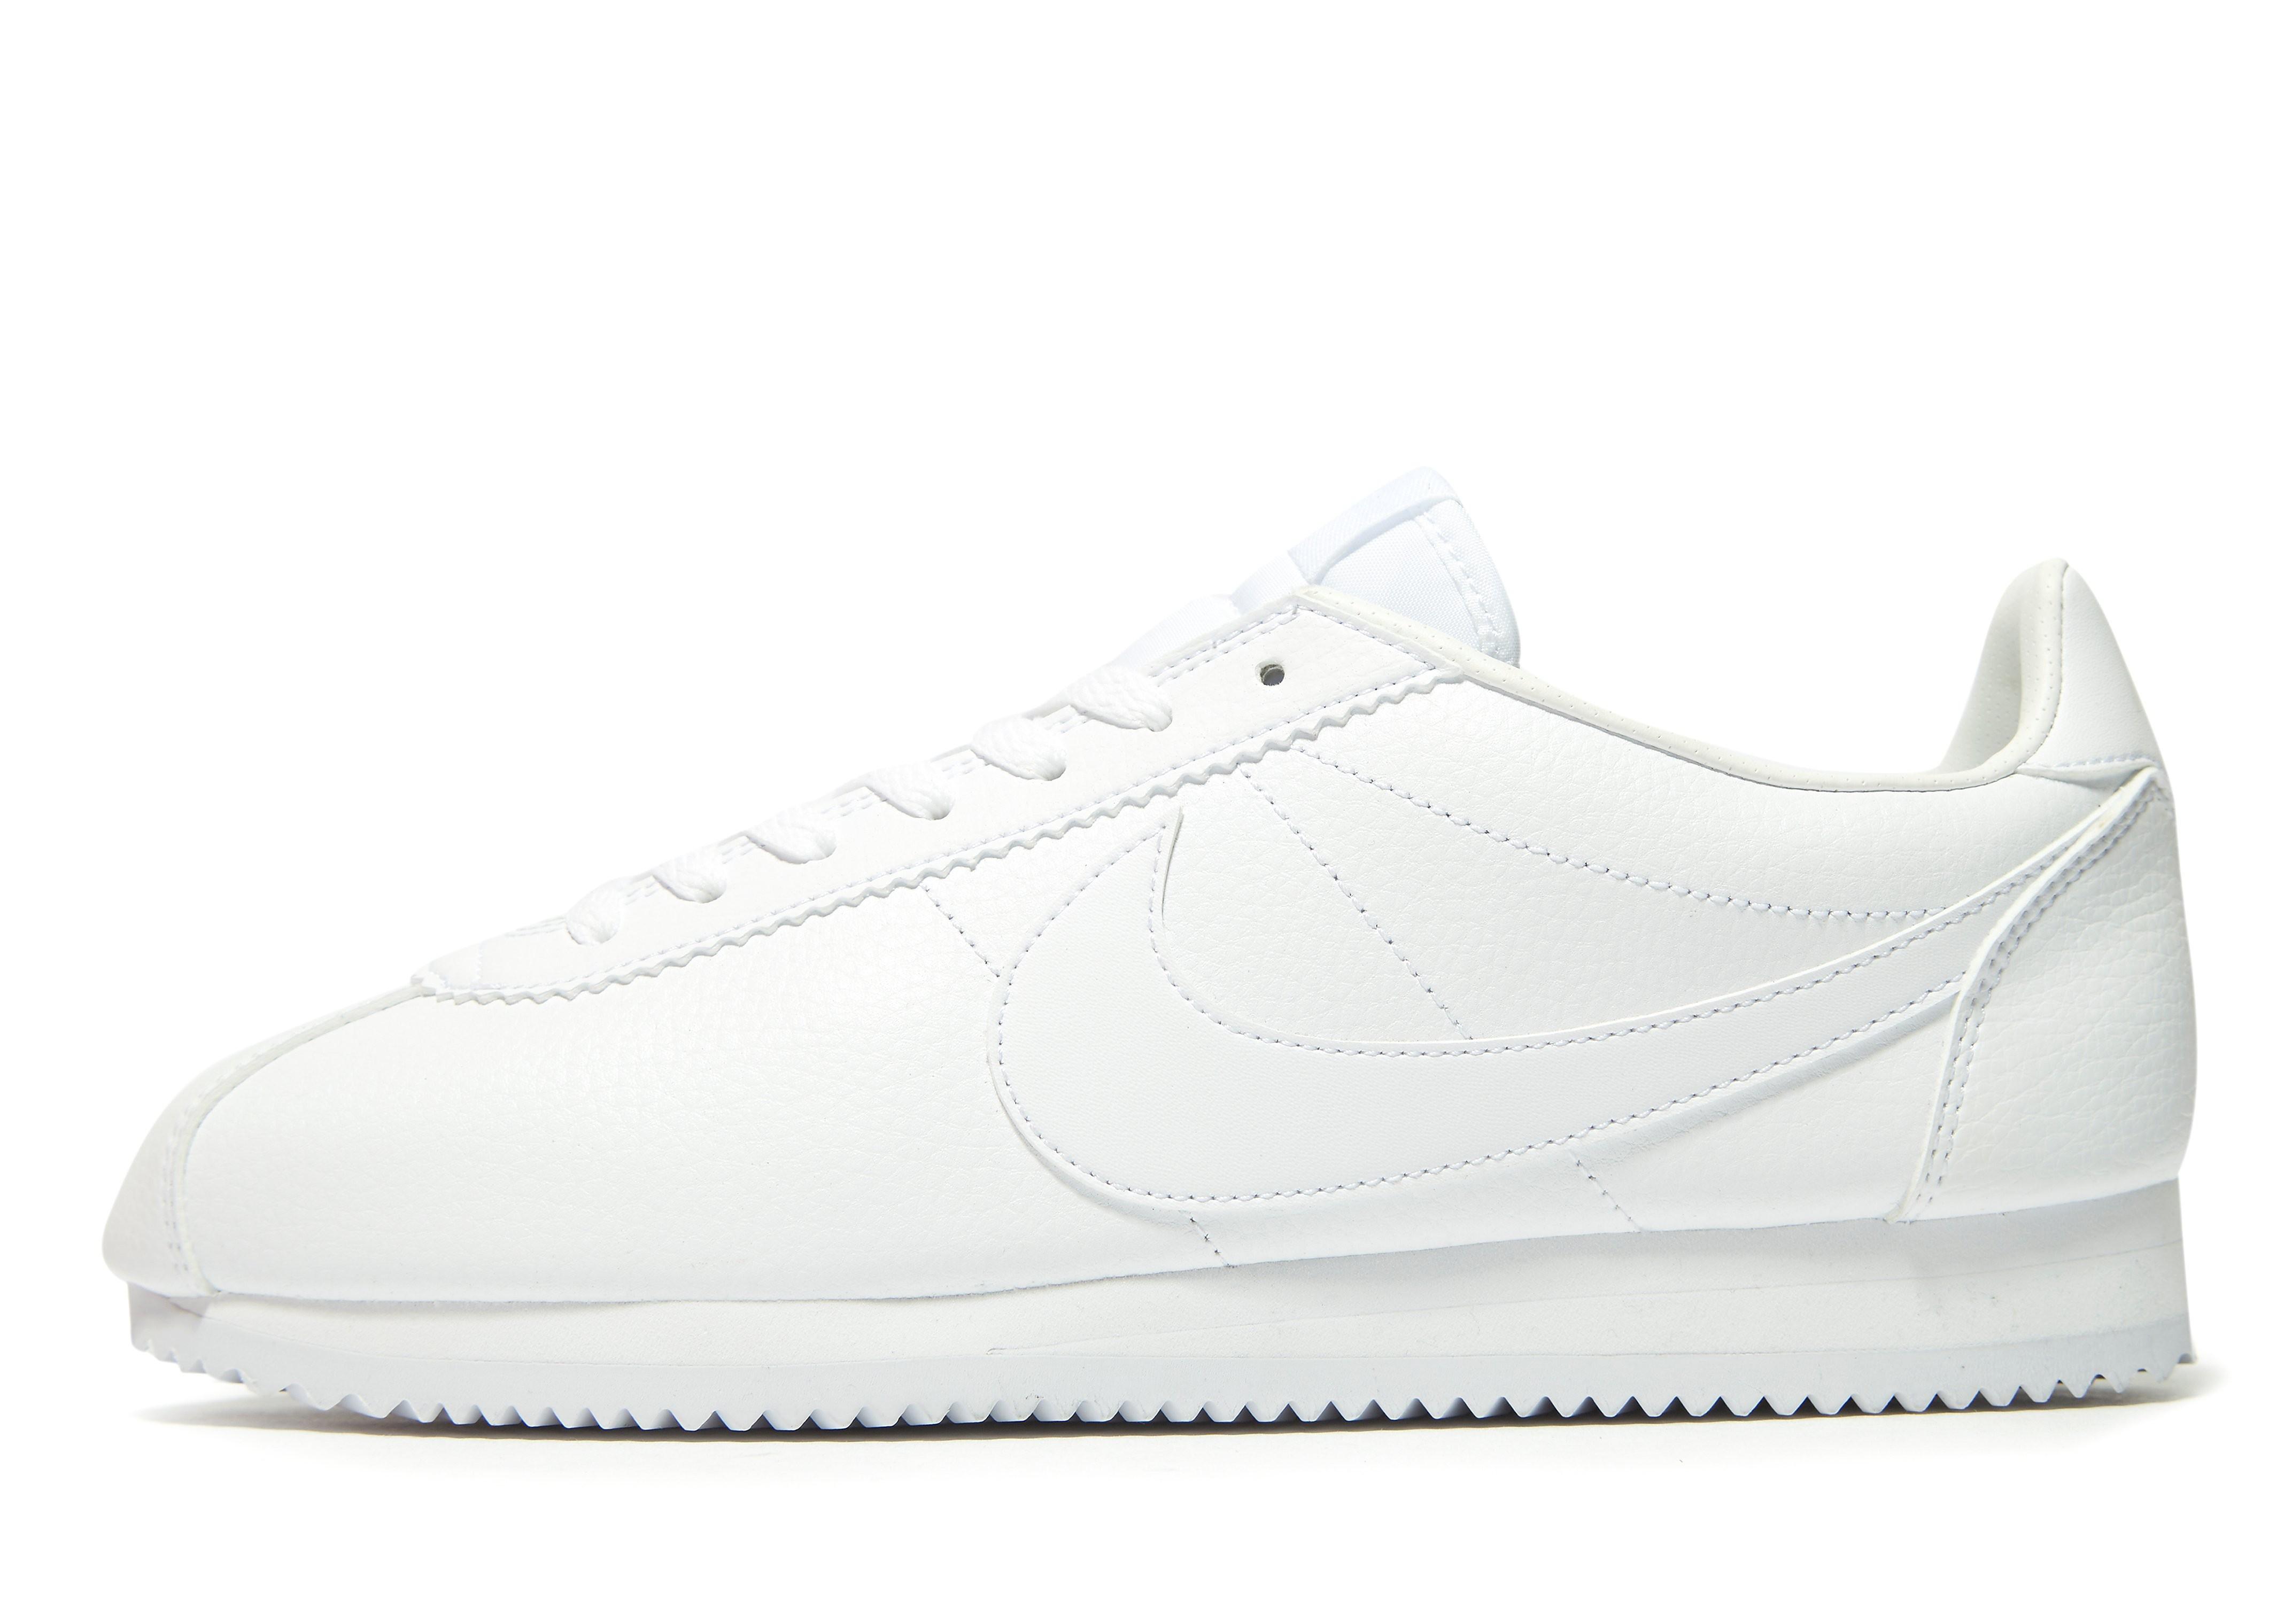 Nike Cortez Leather